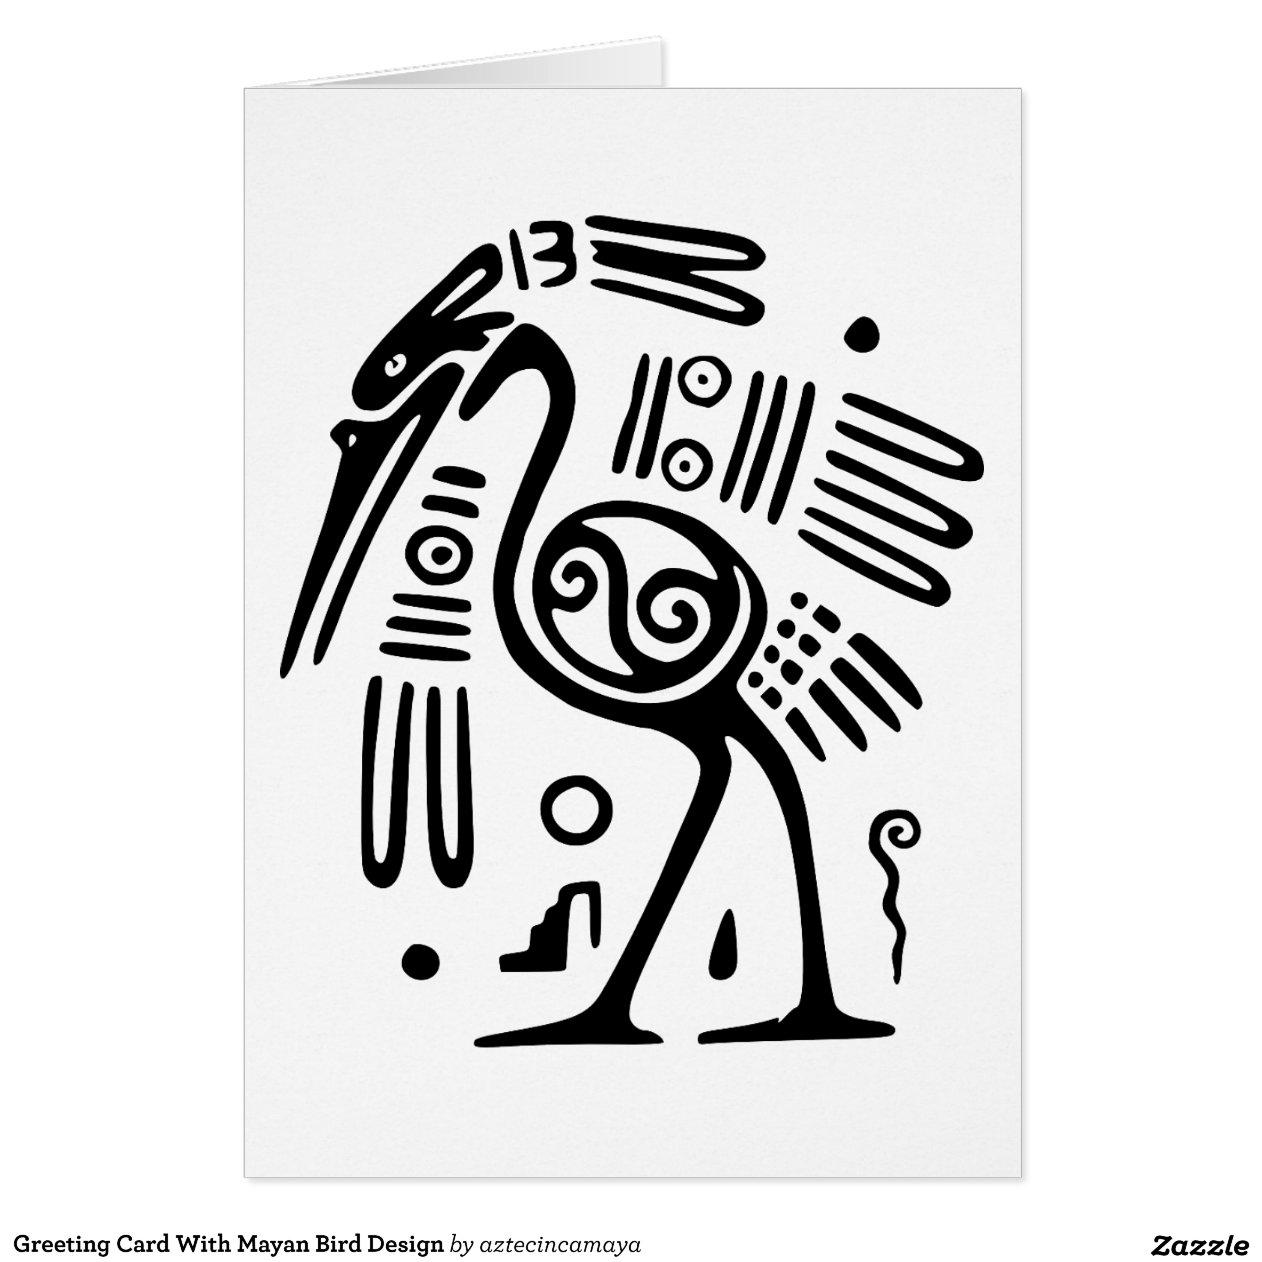 Mayan art designs